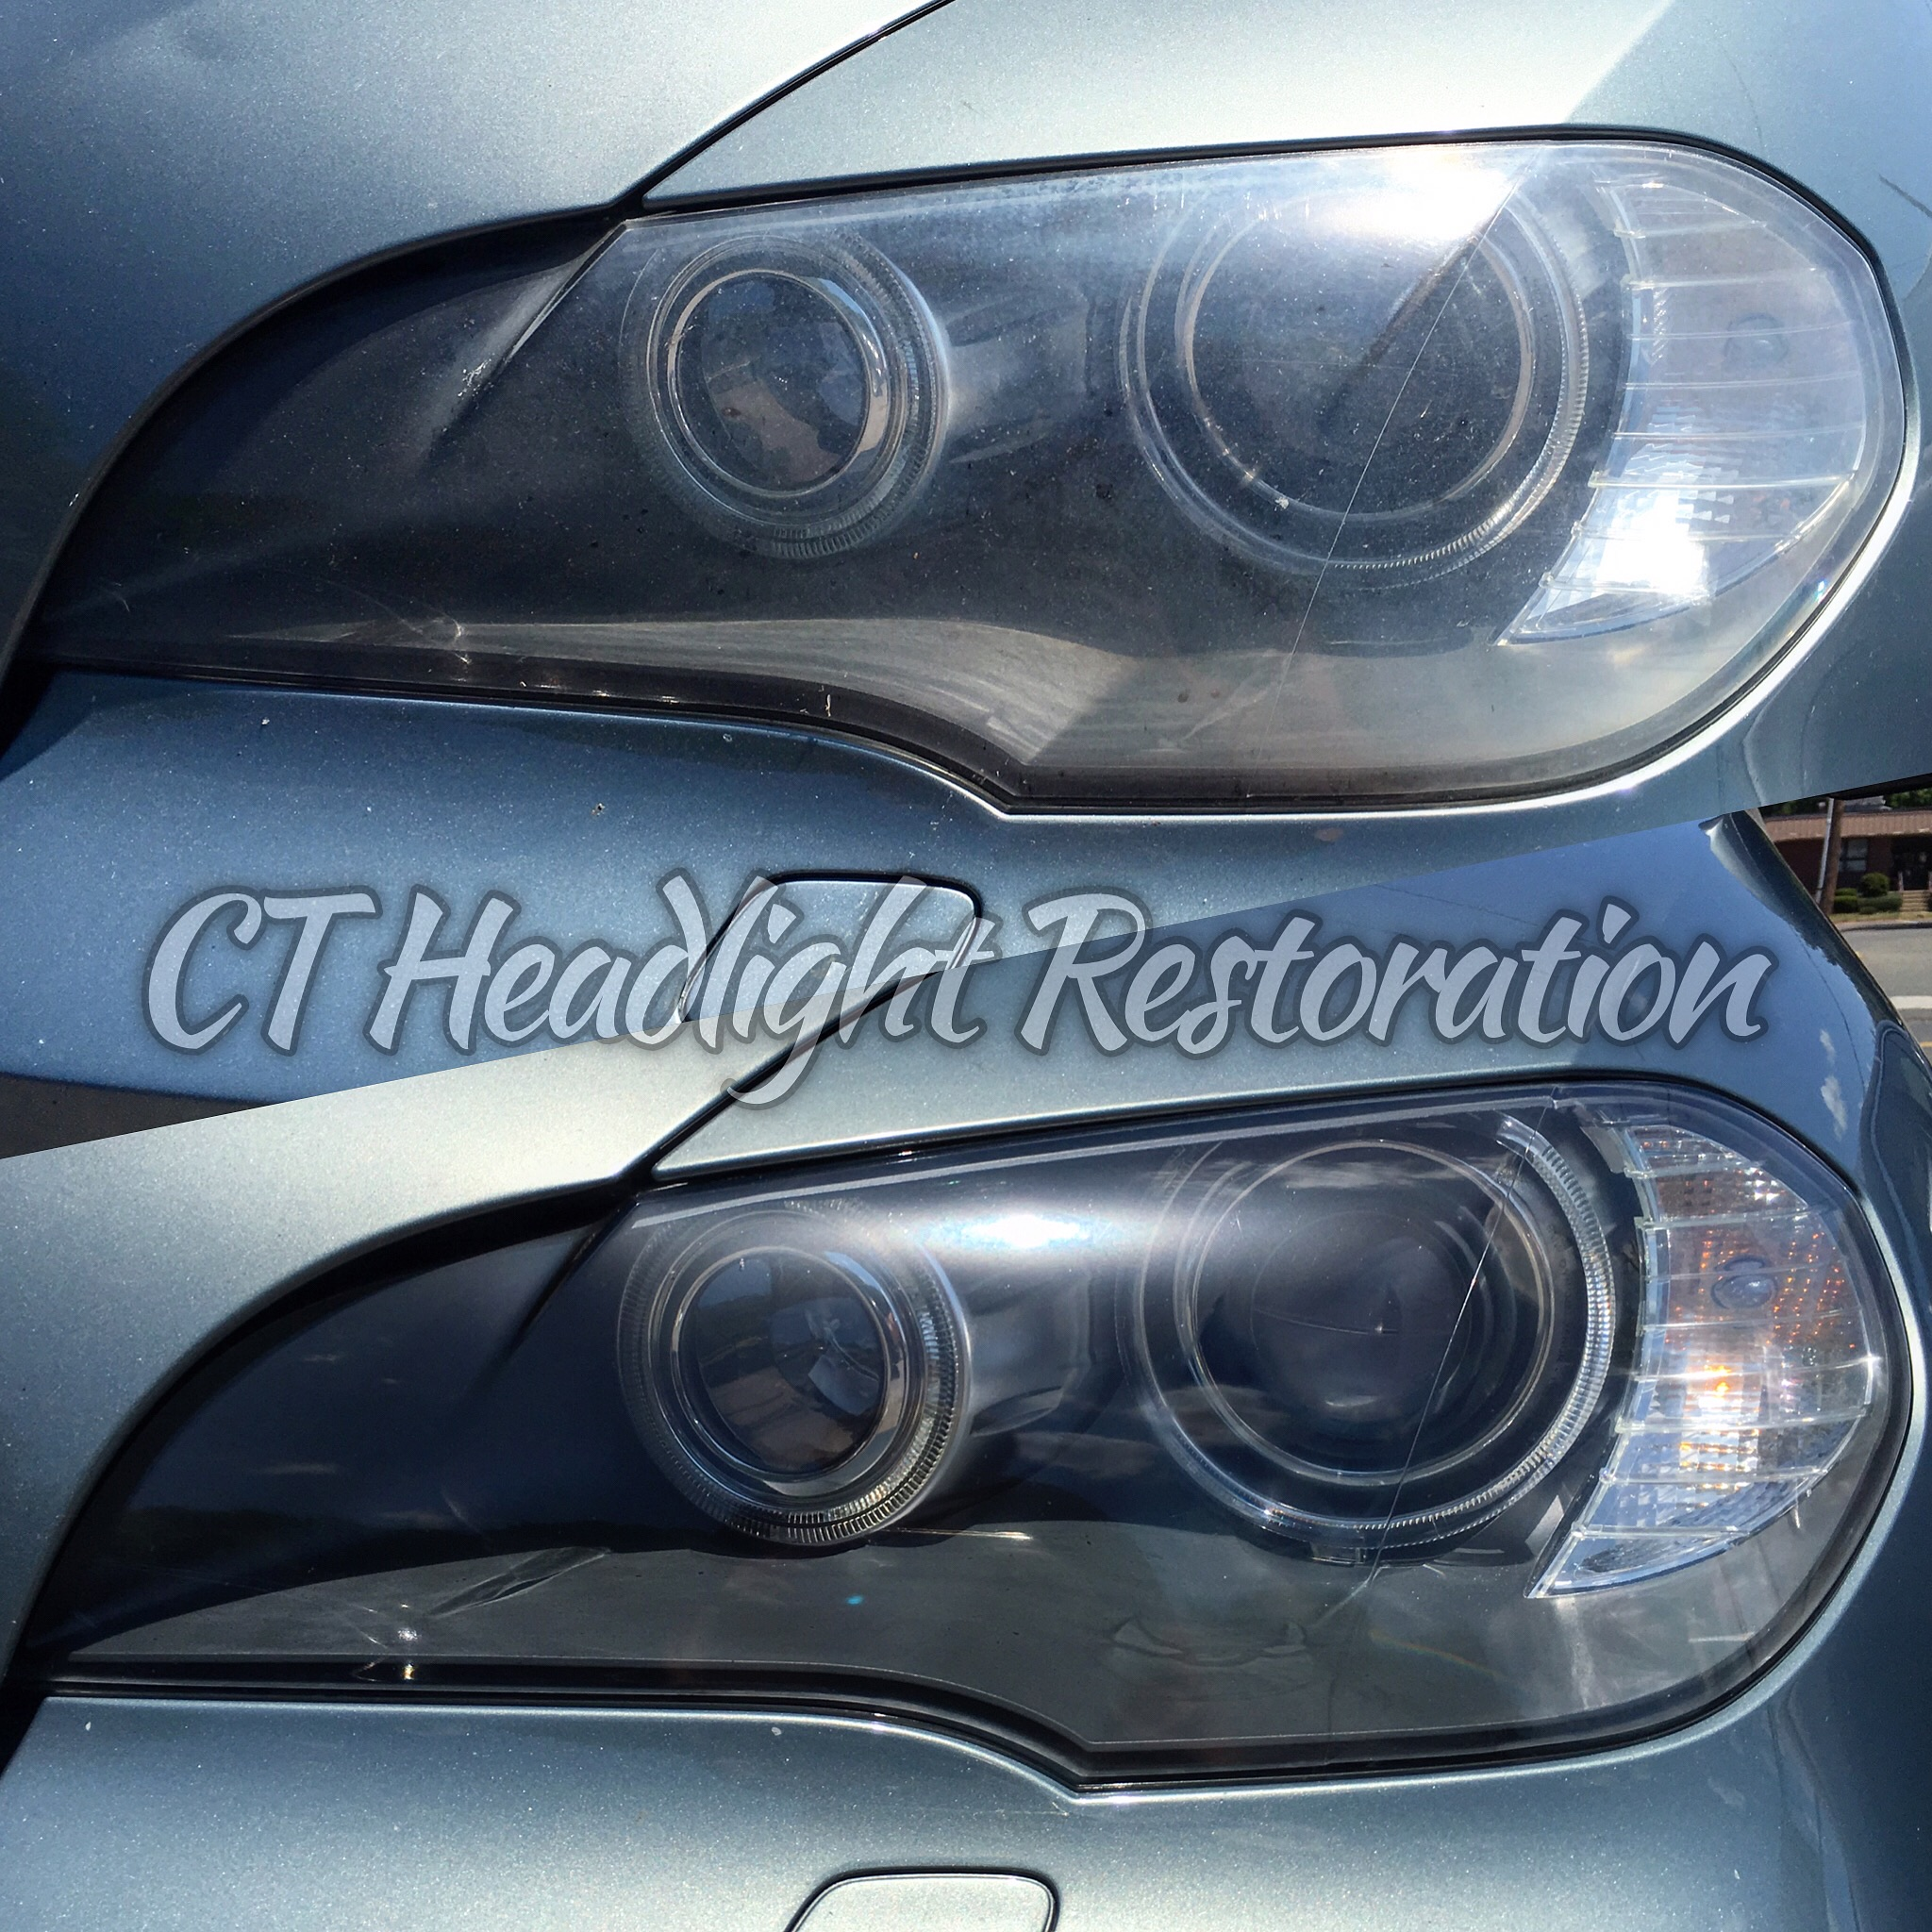 Professional Headlight Restoration BMW X5.jpg